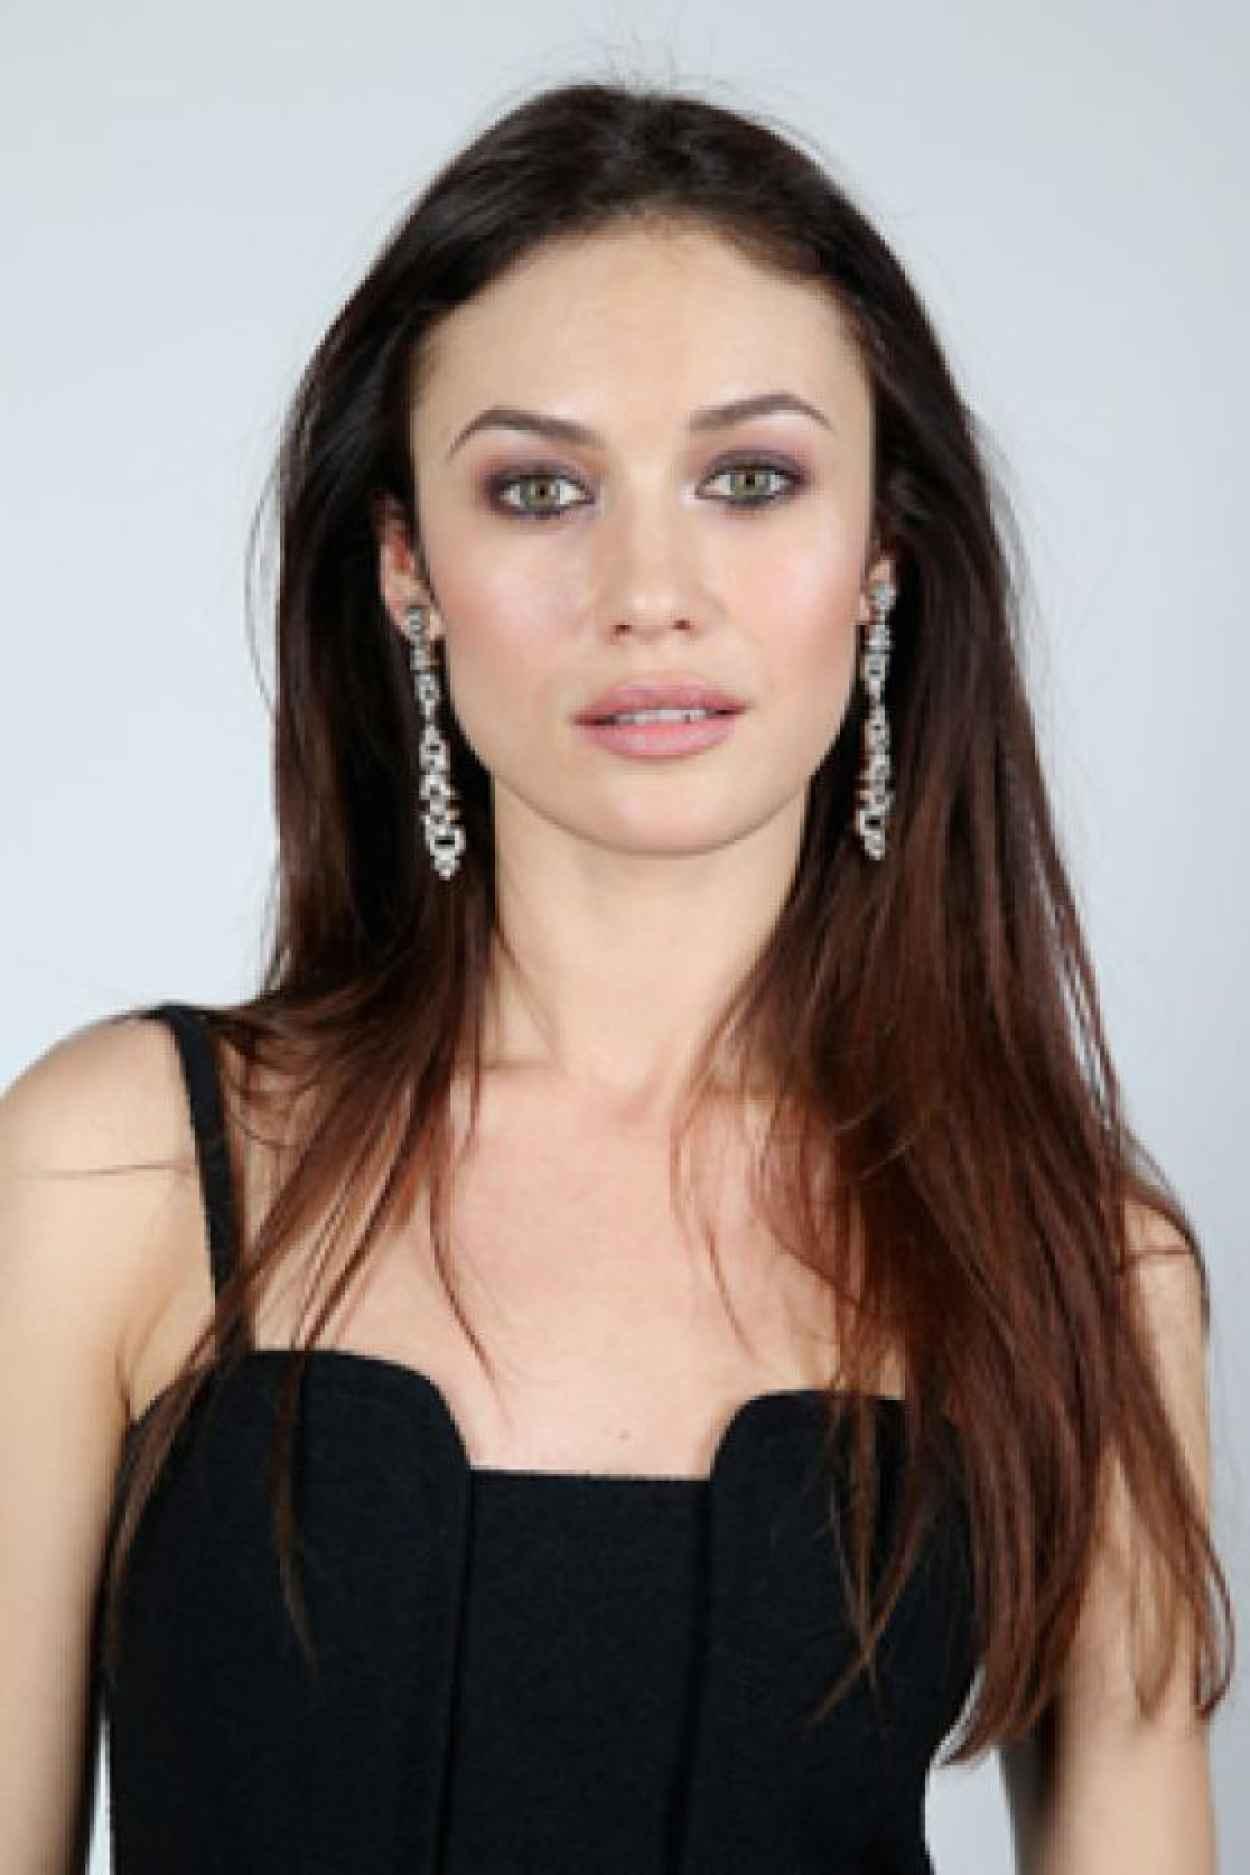 Olga Kurylenko - Portraits at the Charles Finch & Chanel Pre-BAFTA Party - February 2015-1